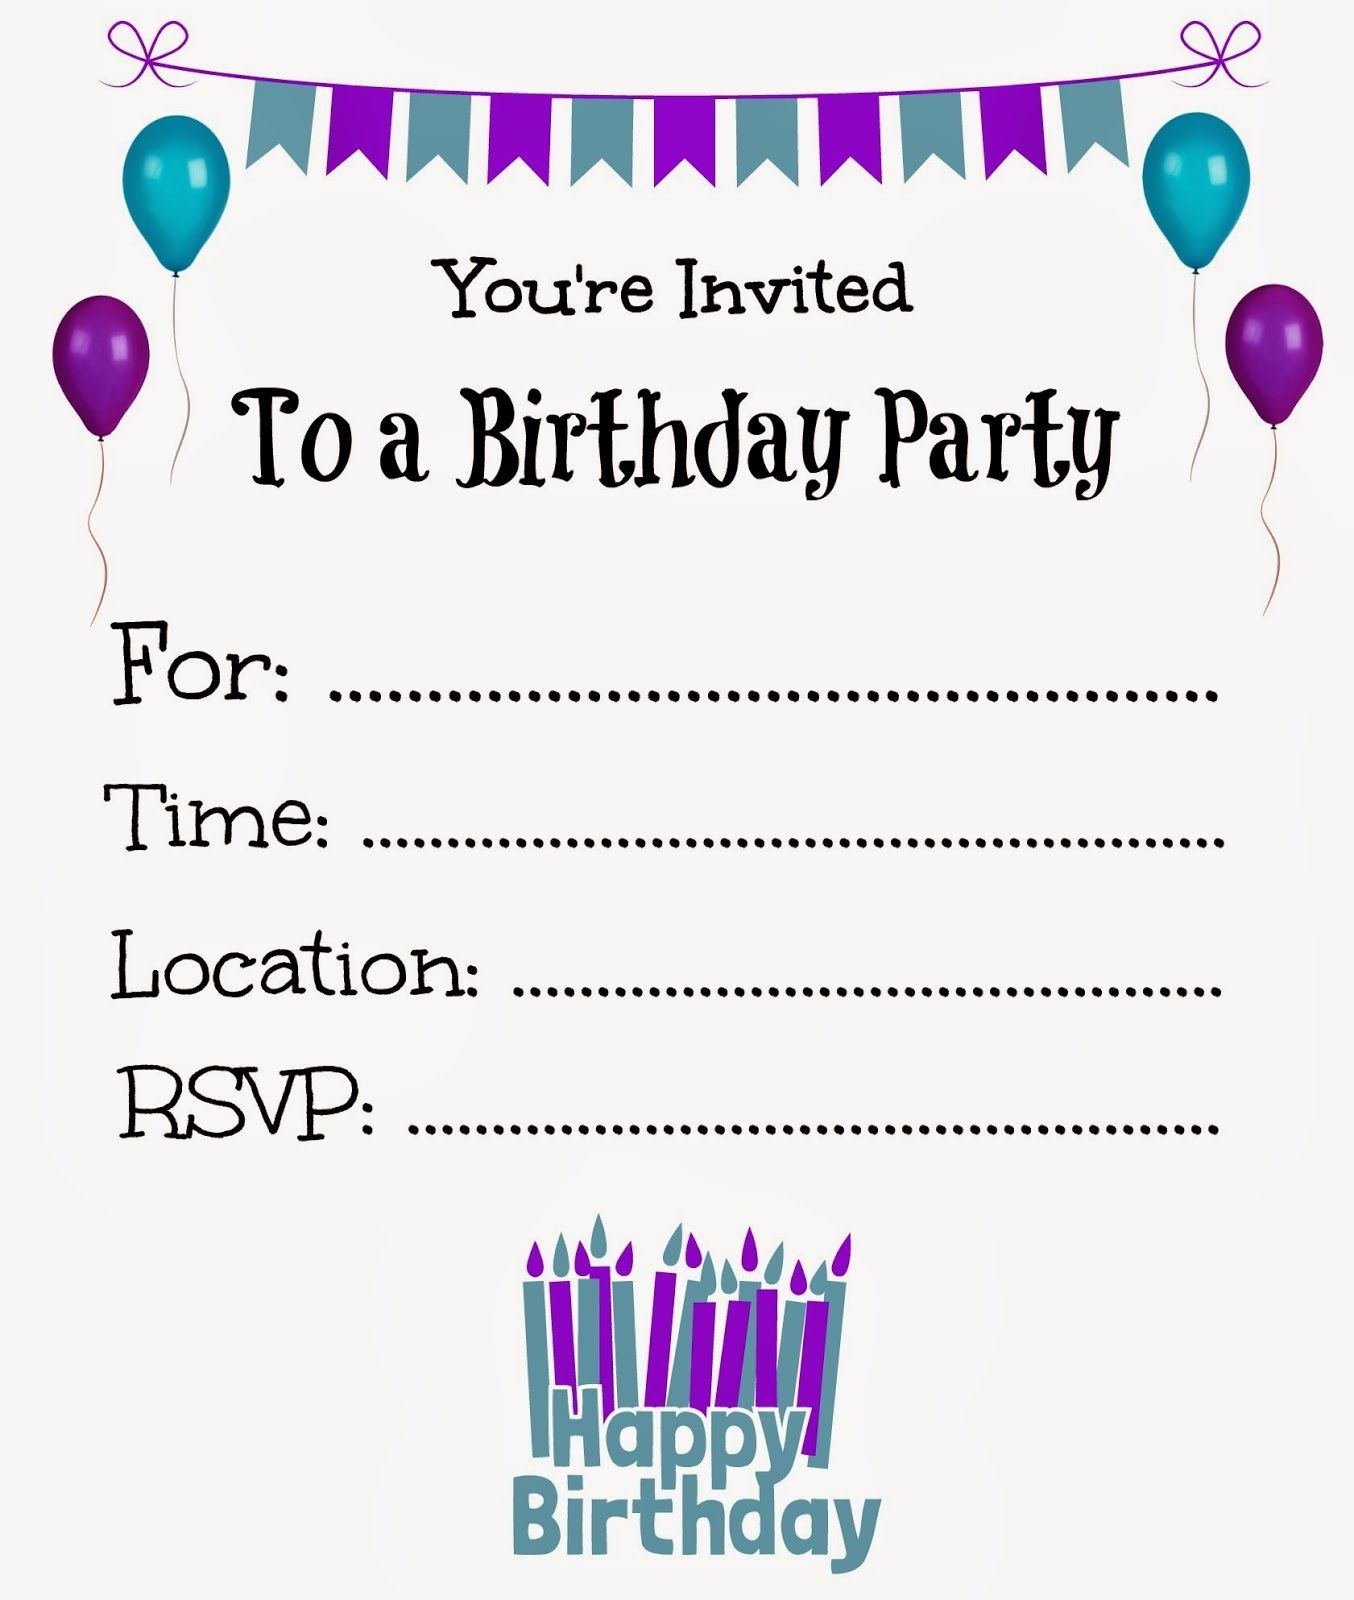 Free Printable Birthday Invitations For Kids #freeprintables - Make Printable Party Invitations Online Free